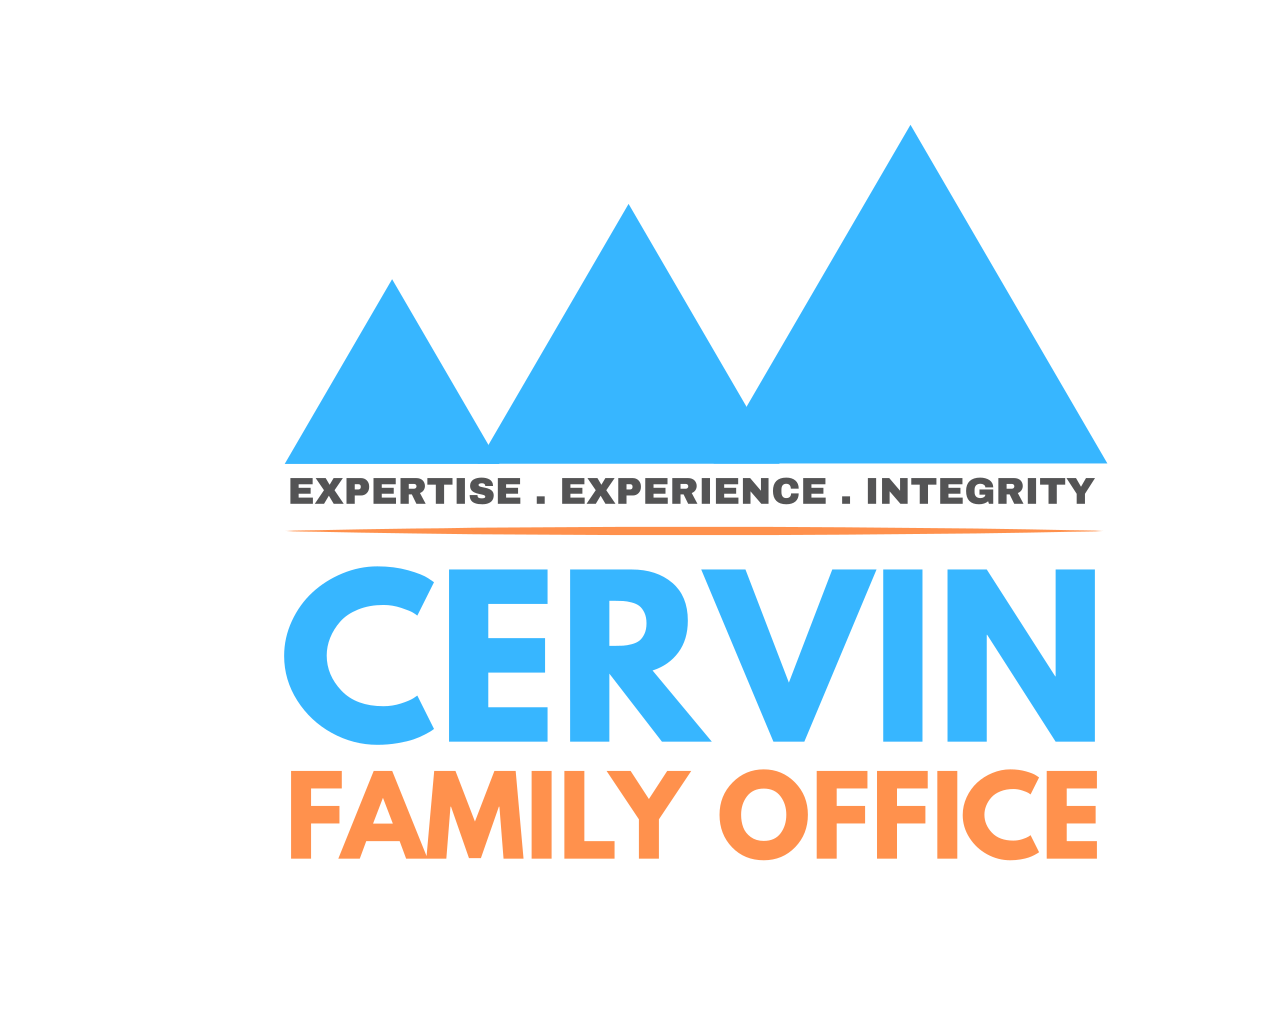 Cervin Family Office